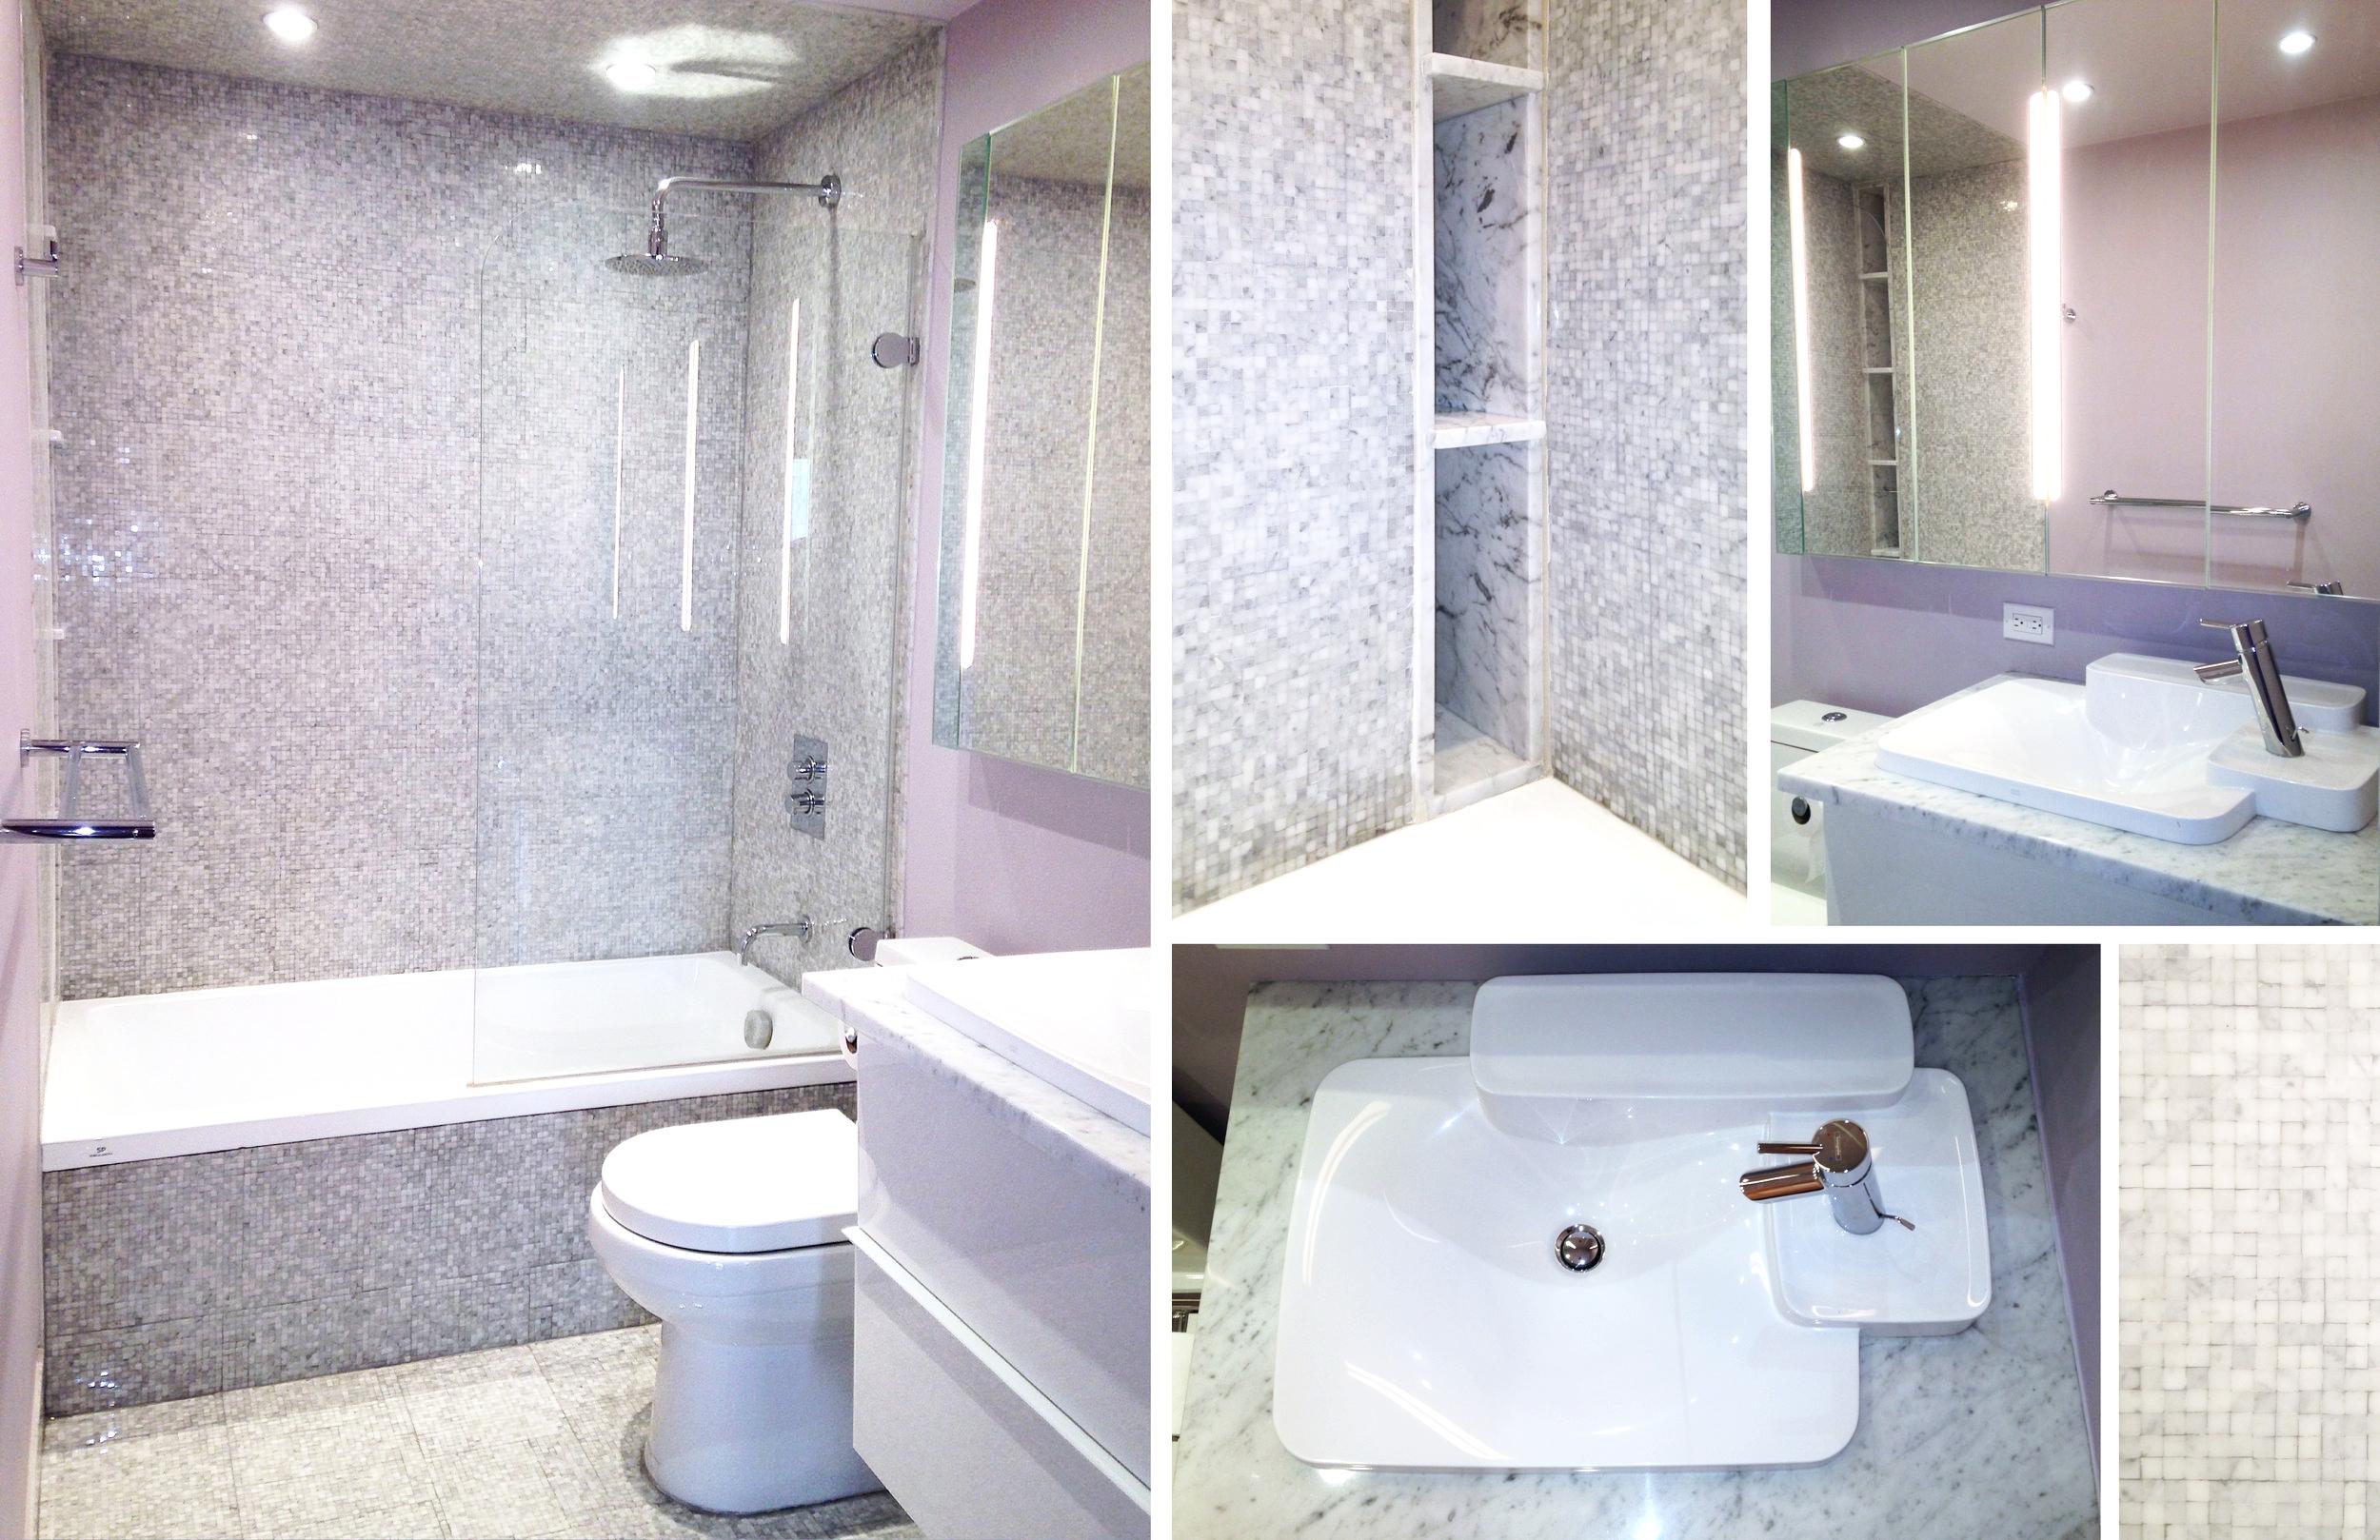 Murthy_Photo-Collage_Bathroom.jpg